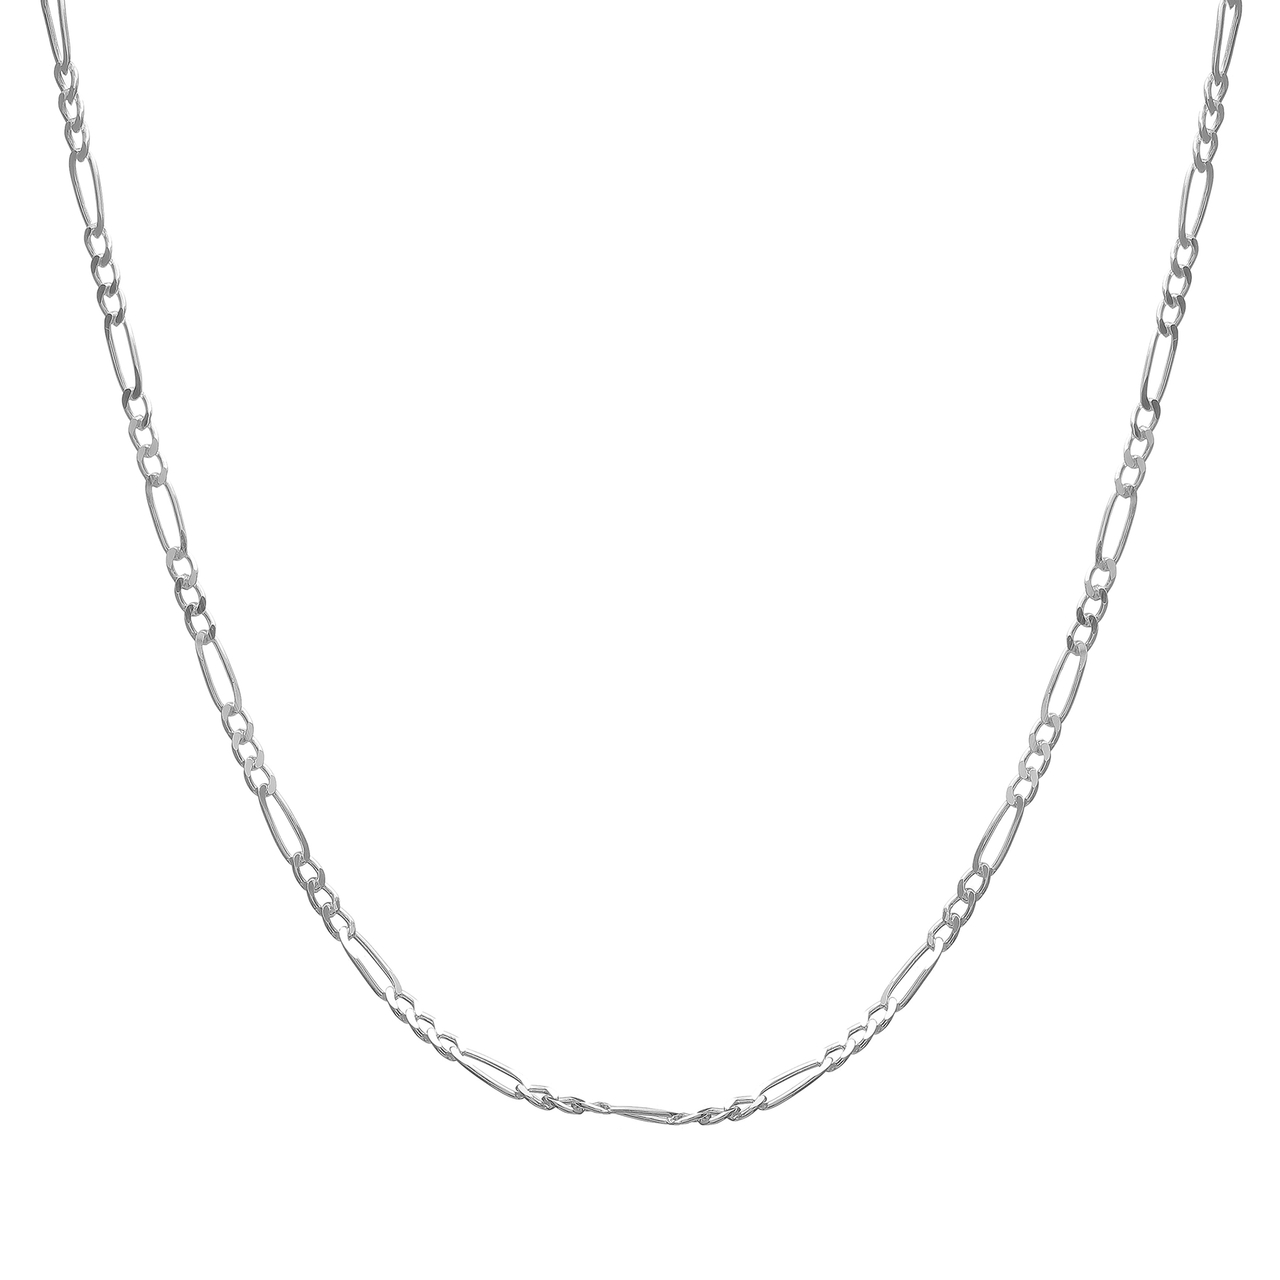 Cordão Fígaro 3x1 -Cod 02